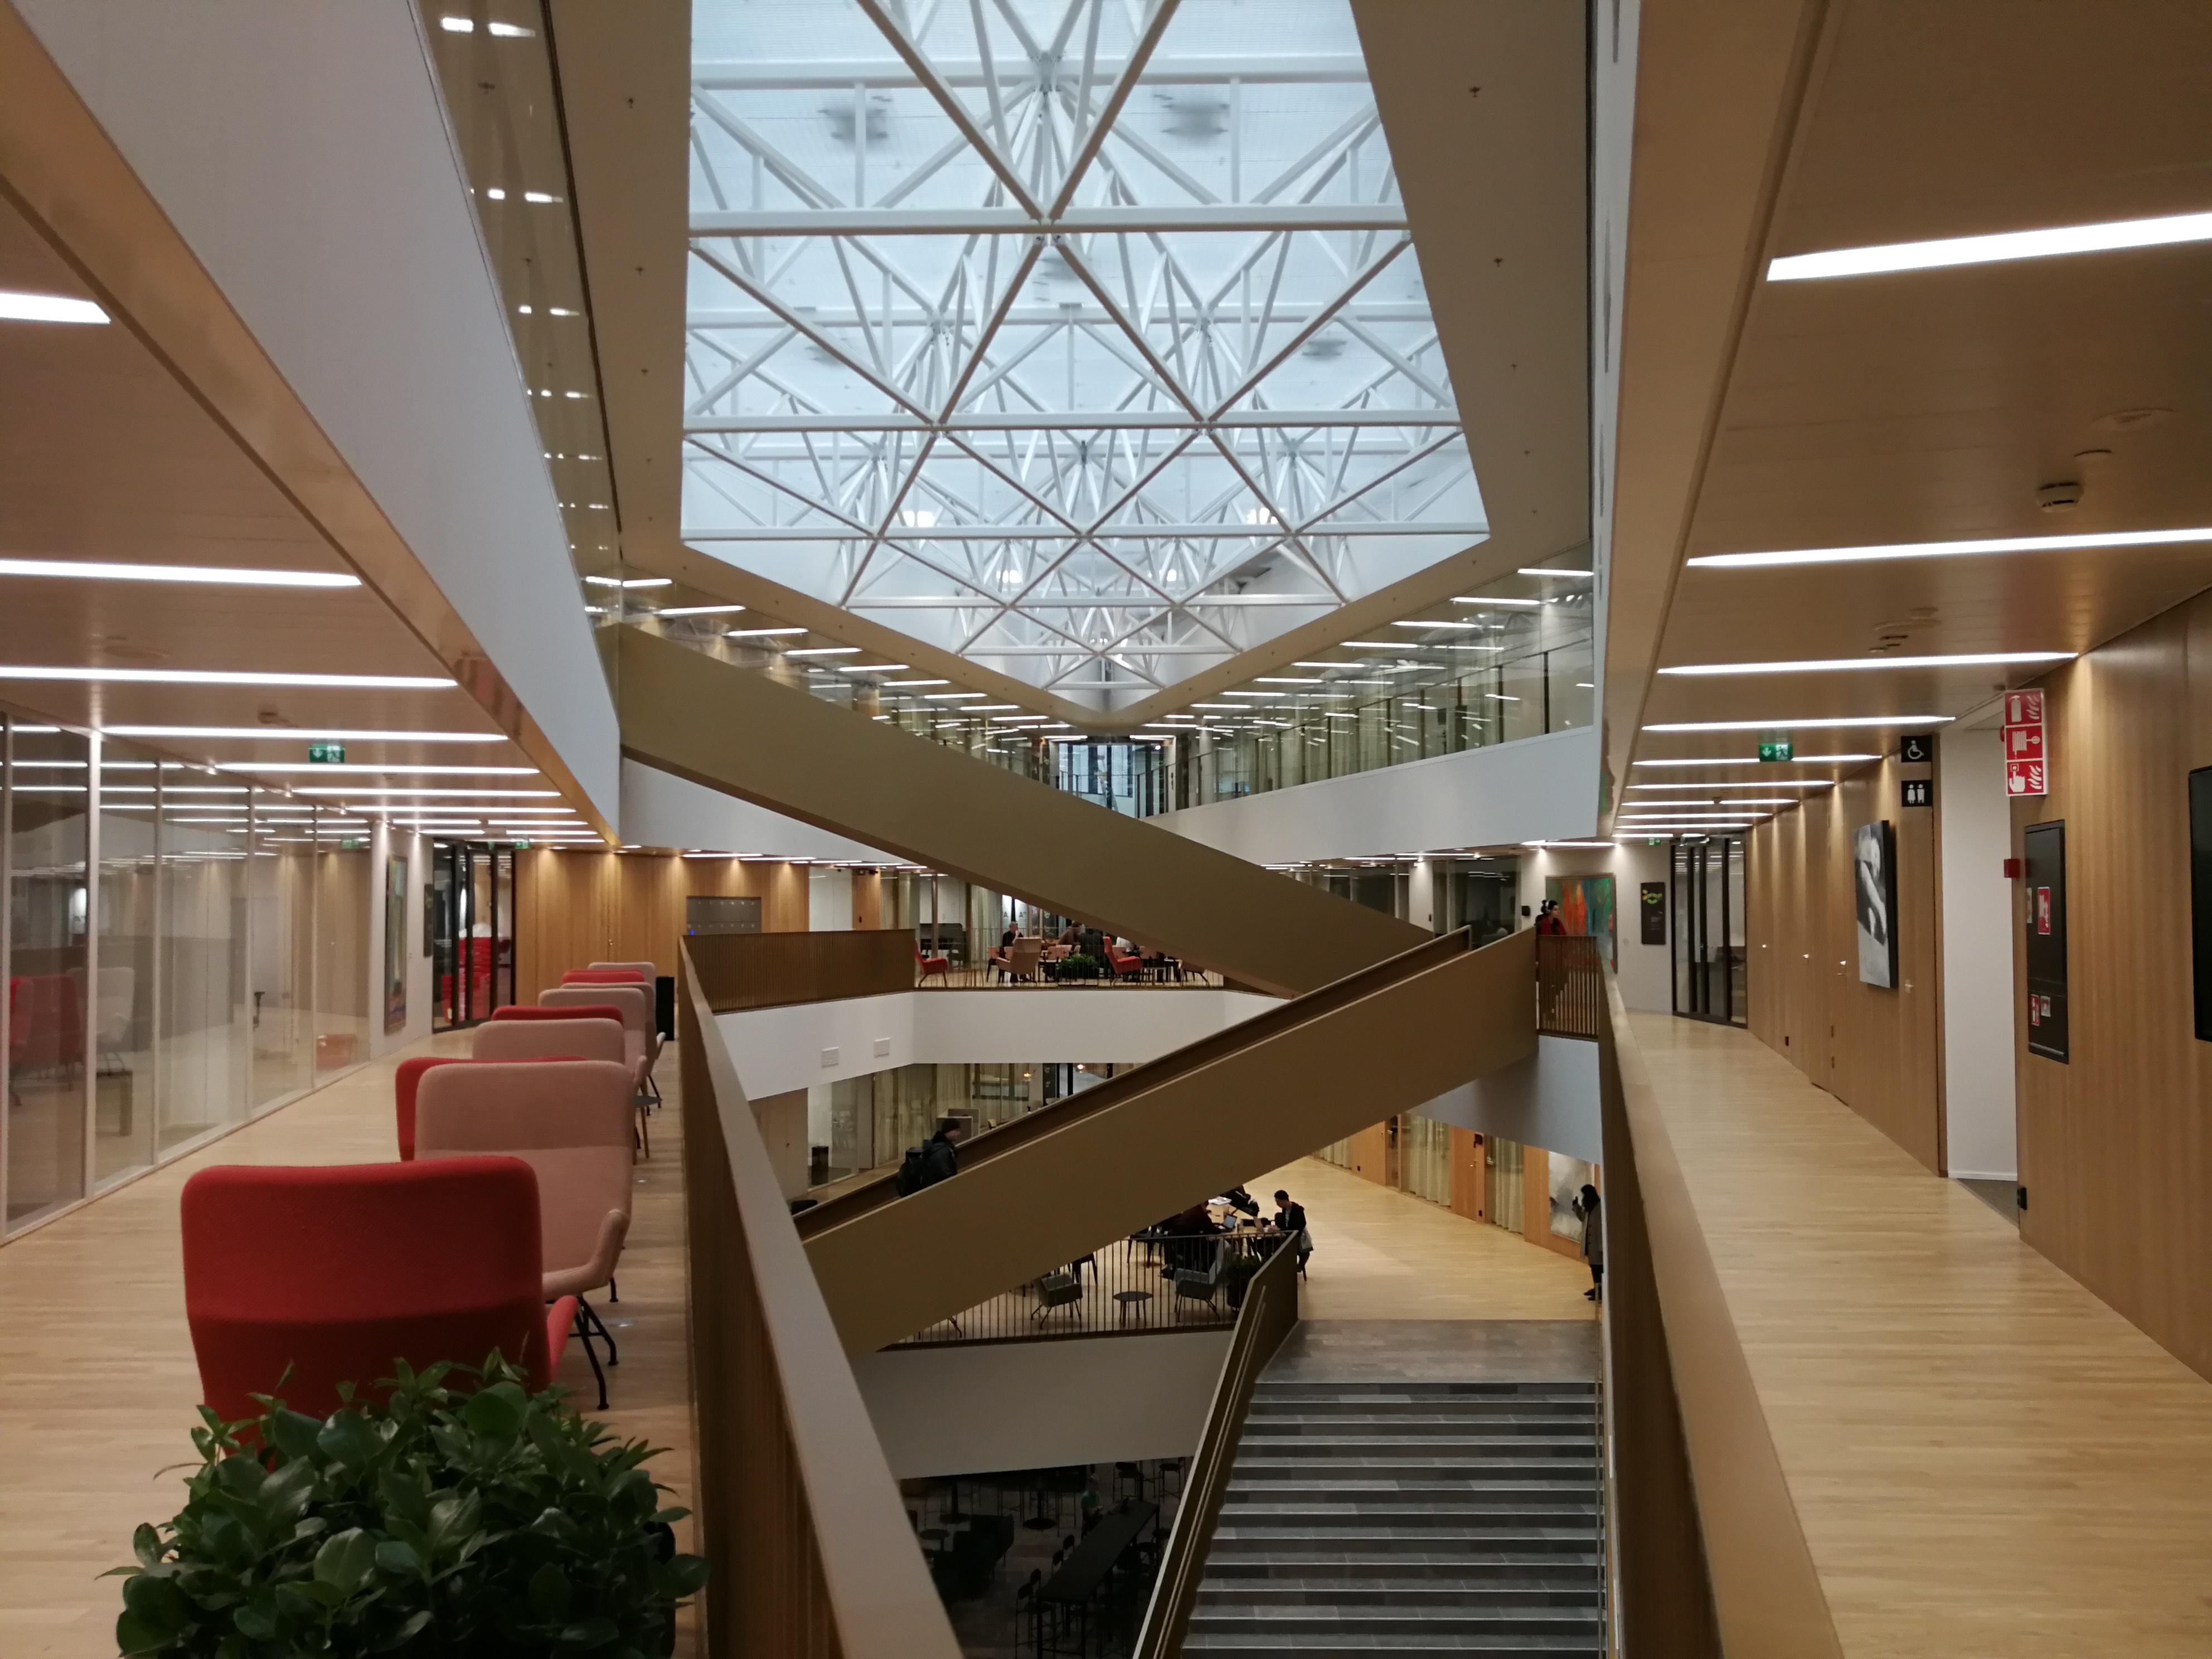 Stairs and lobby of Ekonominaukio 1 second floor